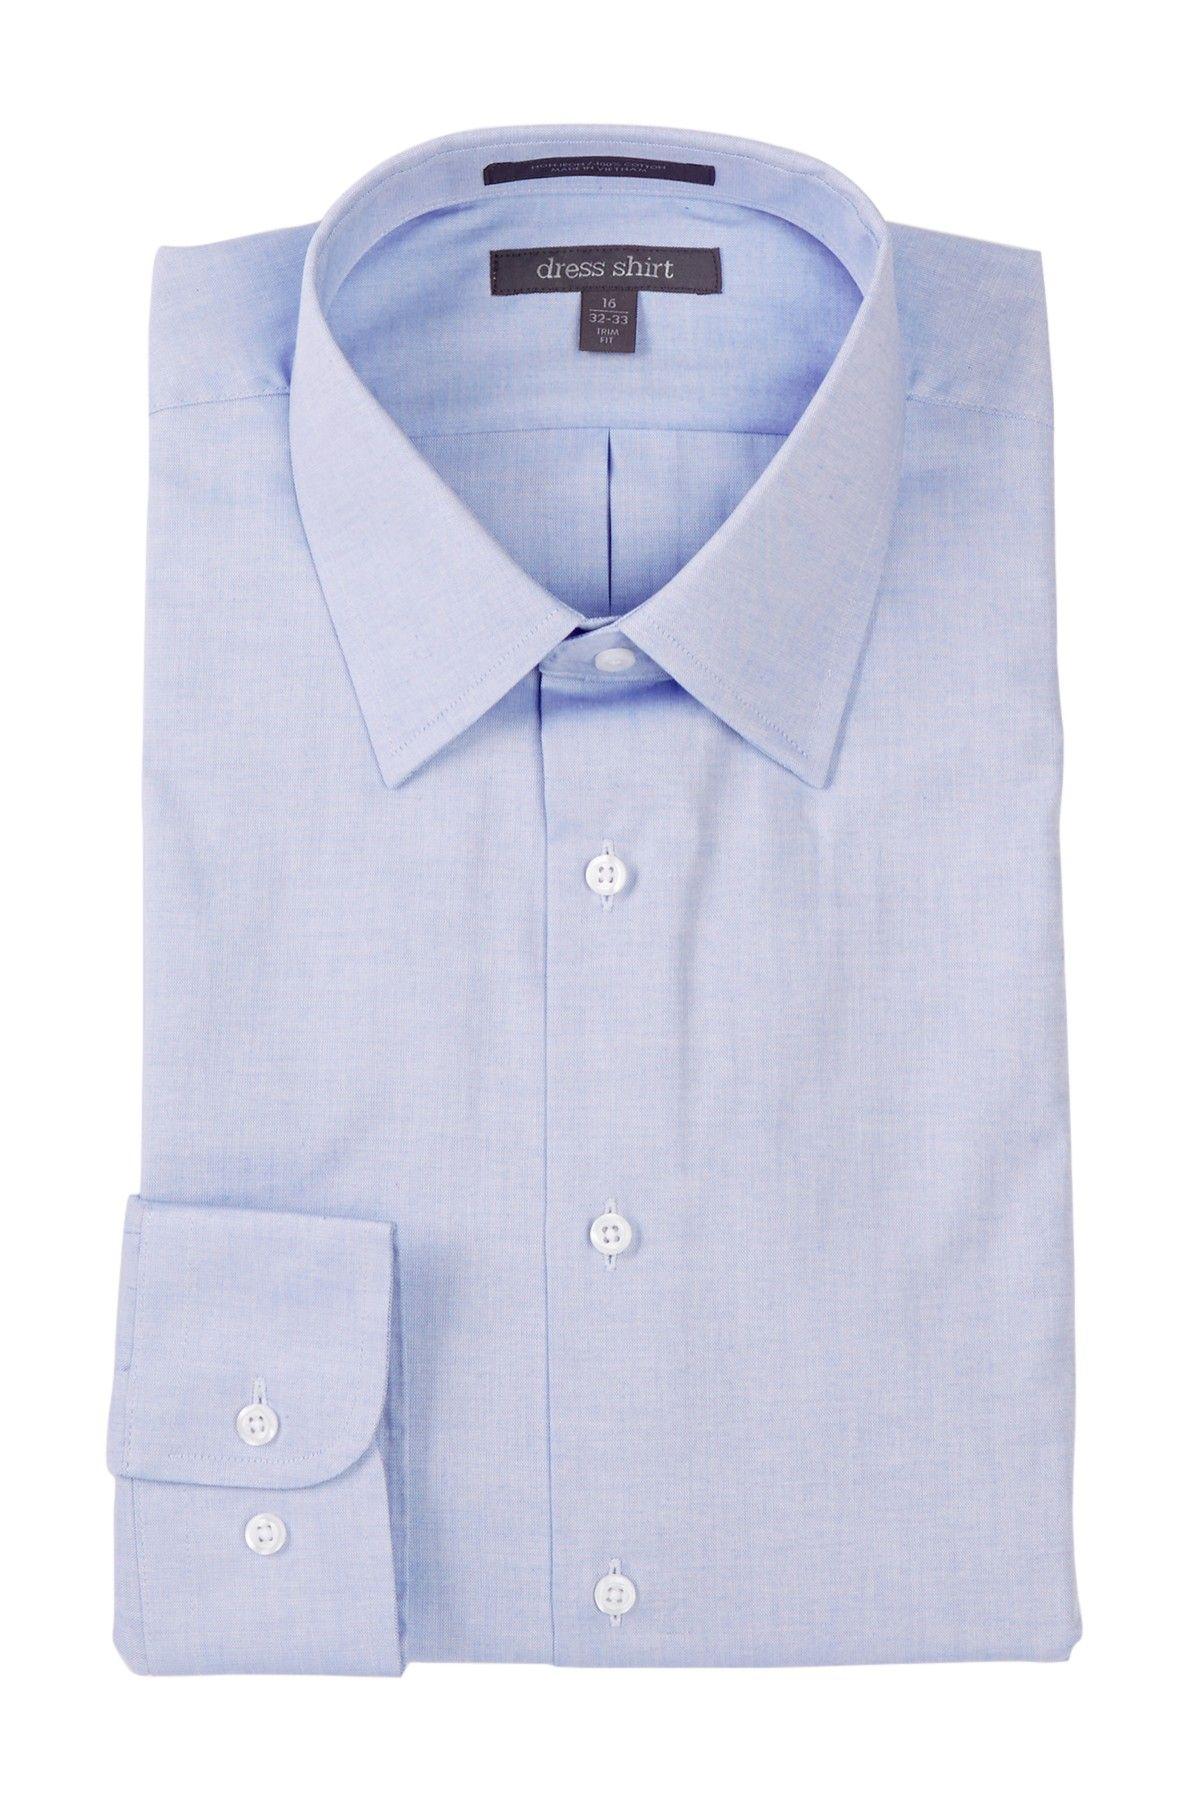 Trim Fit Pinpoint Non-Iron Dress Shirt